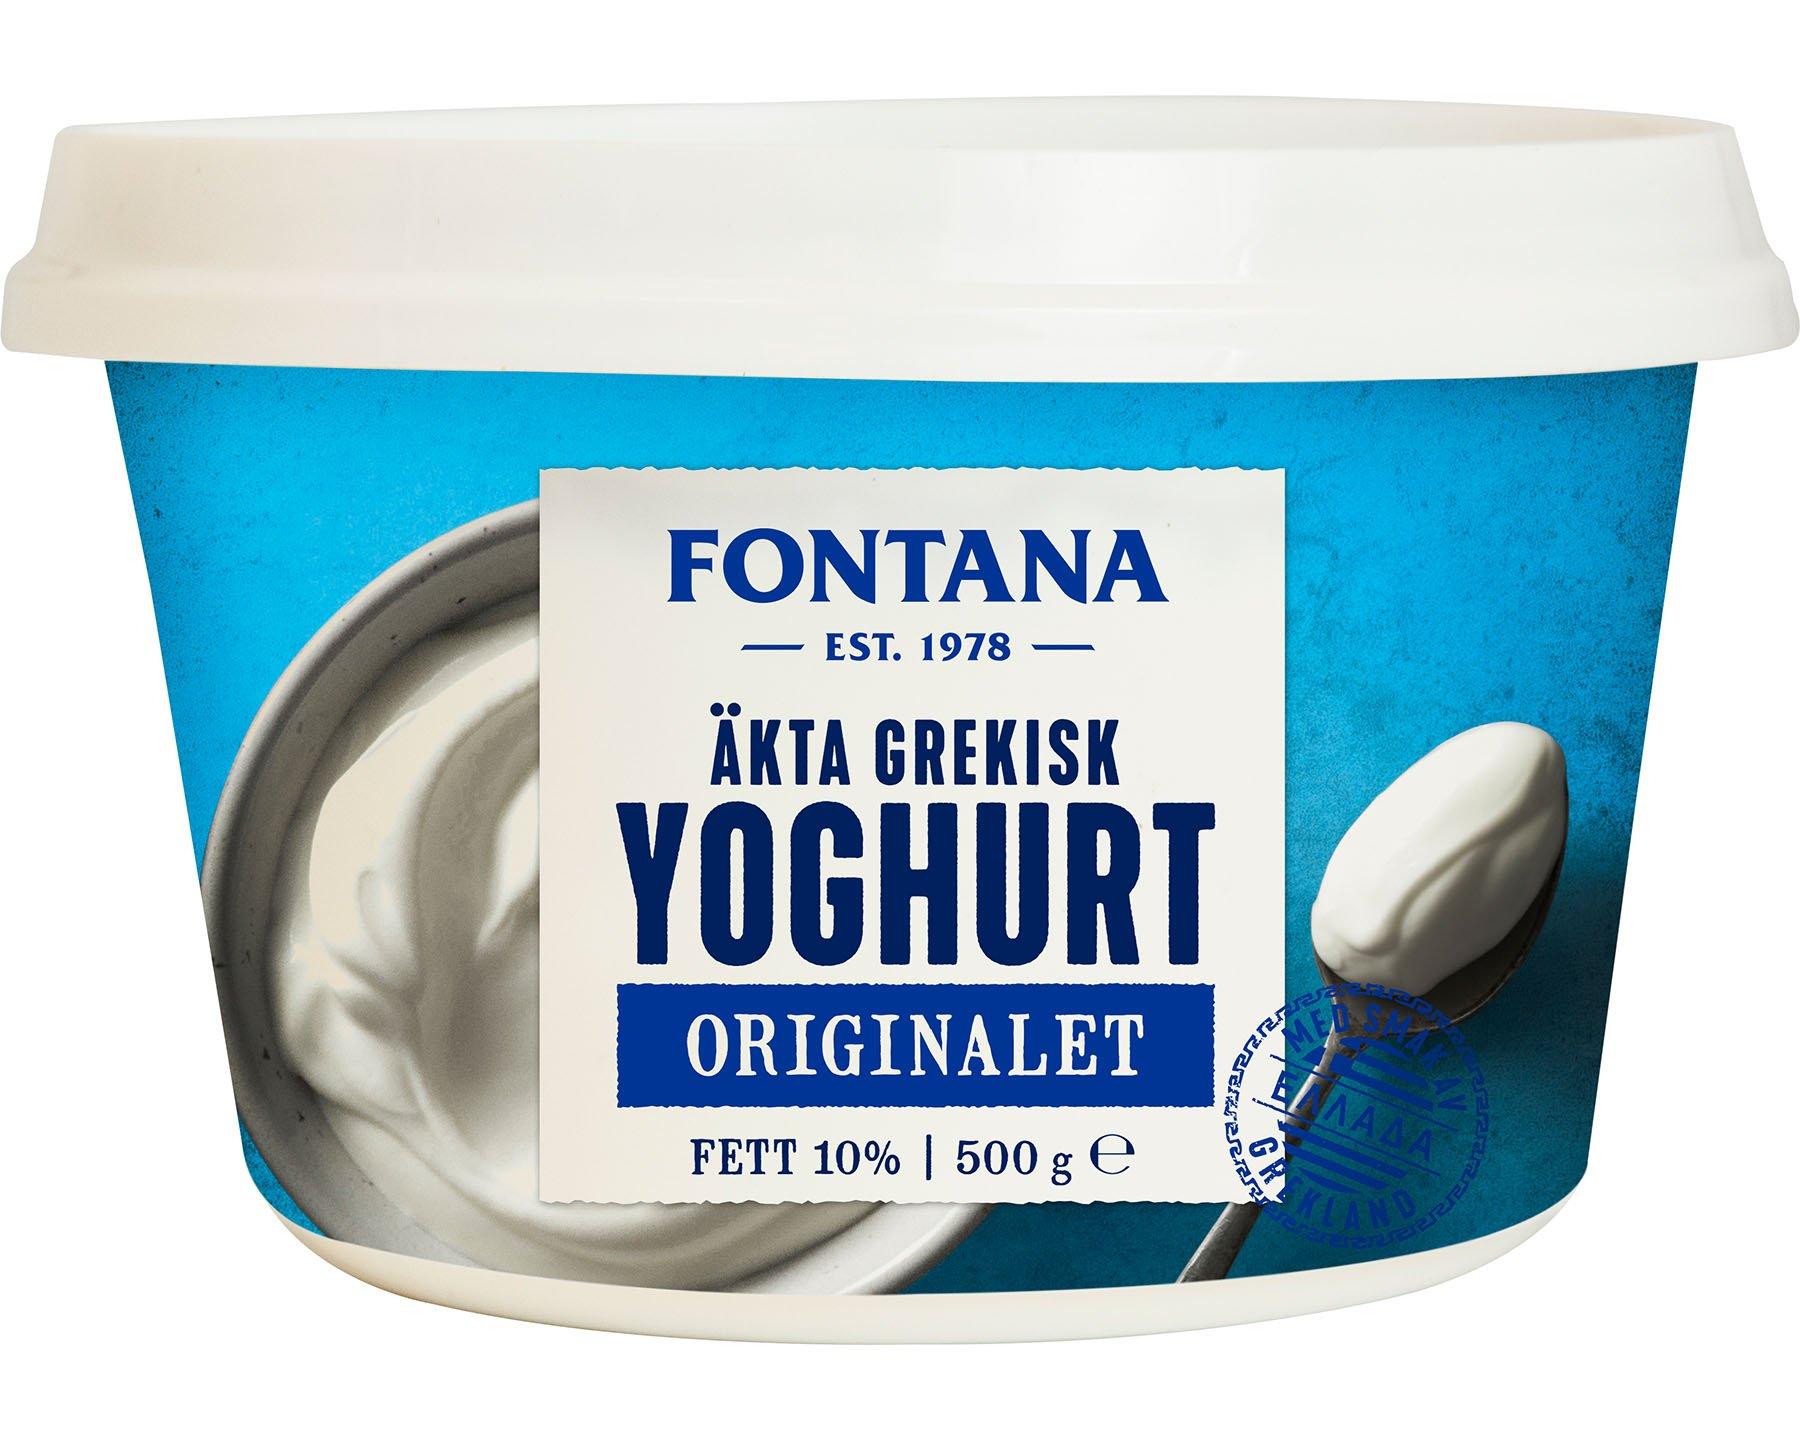 Fontana Äkta Grekisk Yoghurt 10 percent